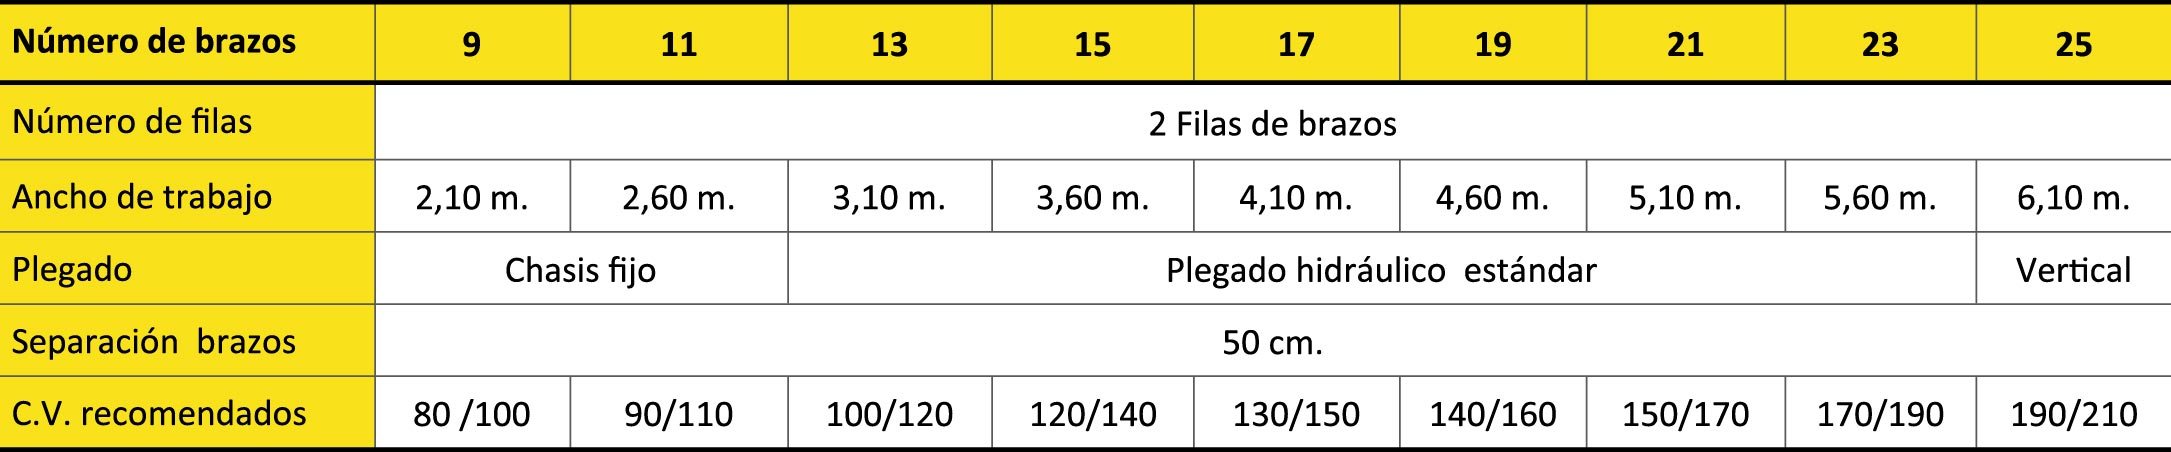 chisel-ligero-grafica2